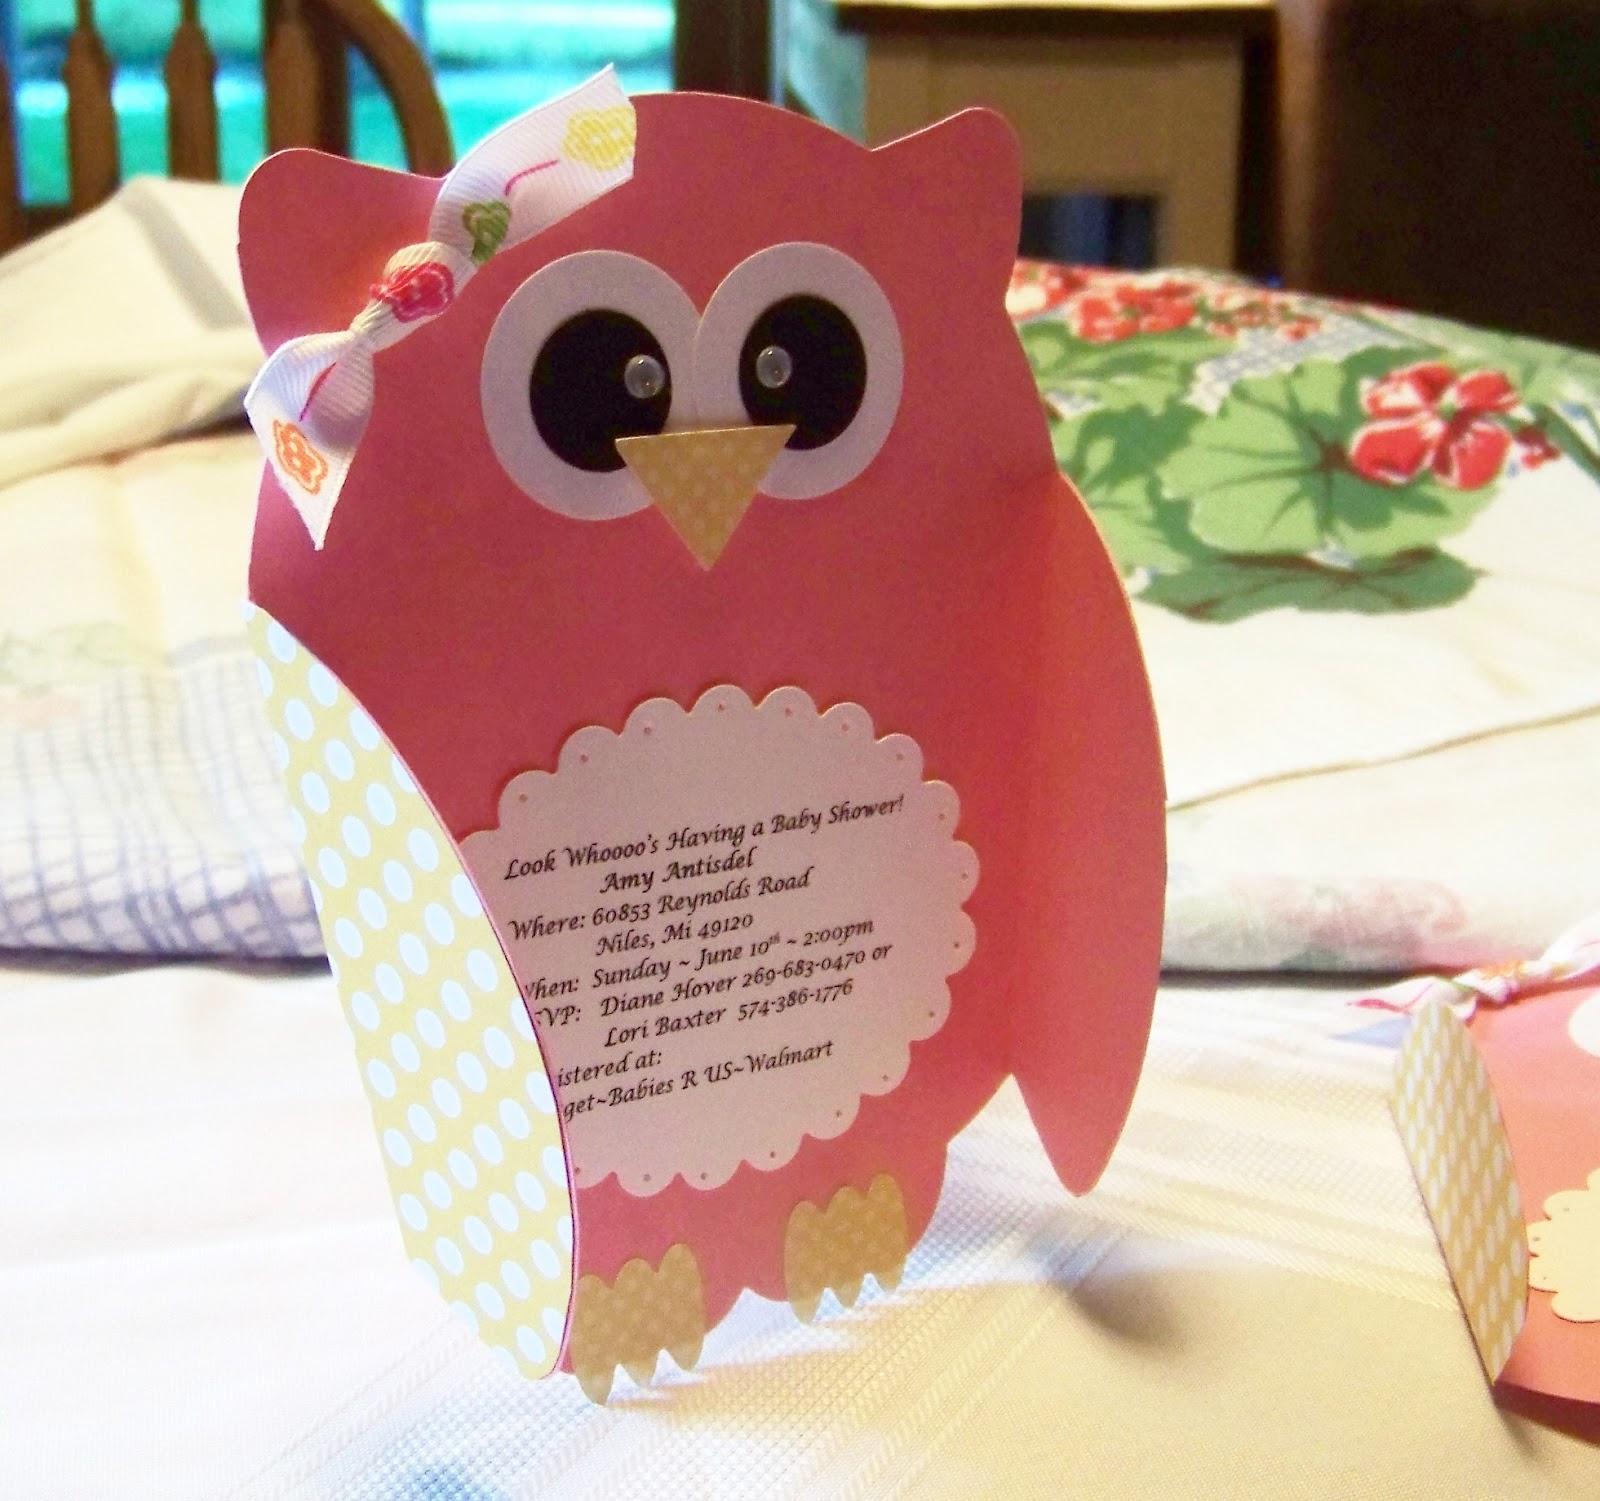 Nellies Nest: Little Owl Invites